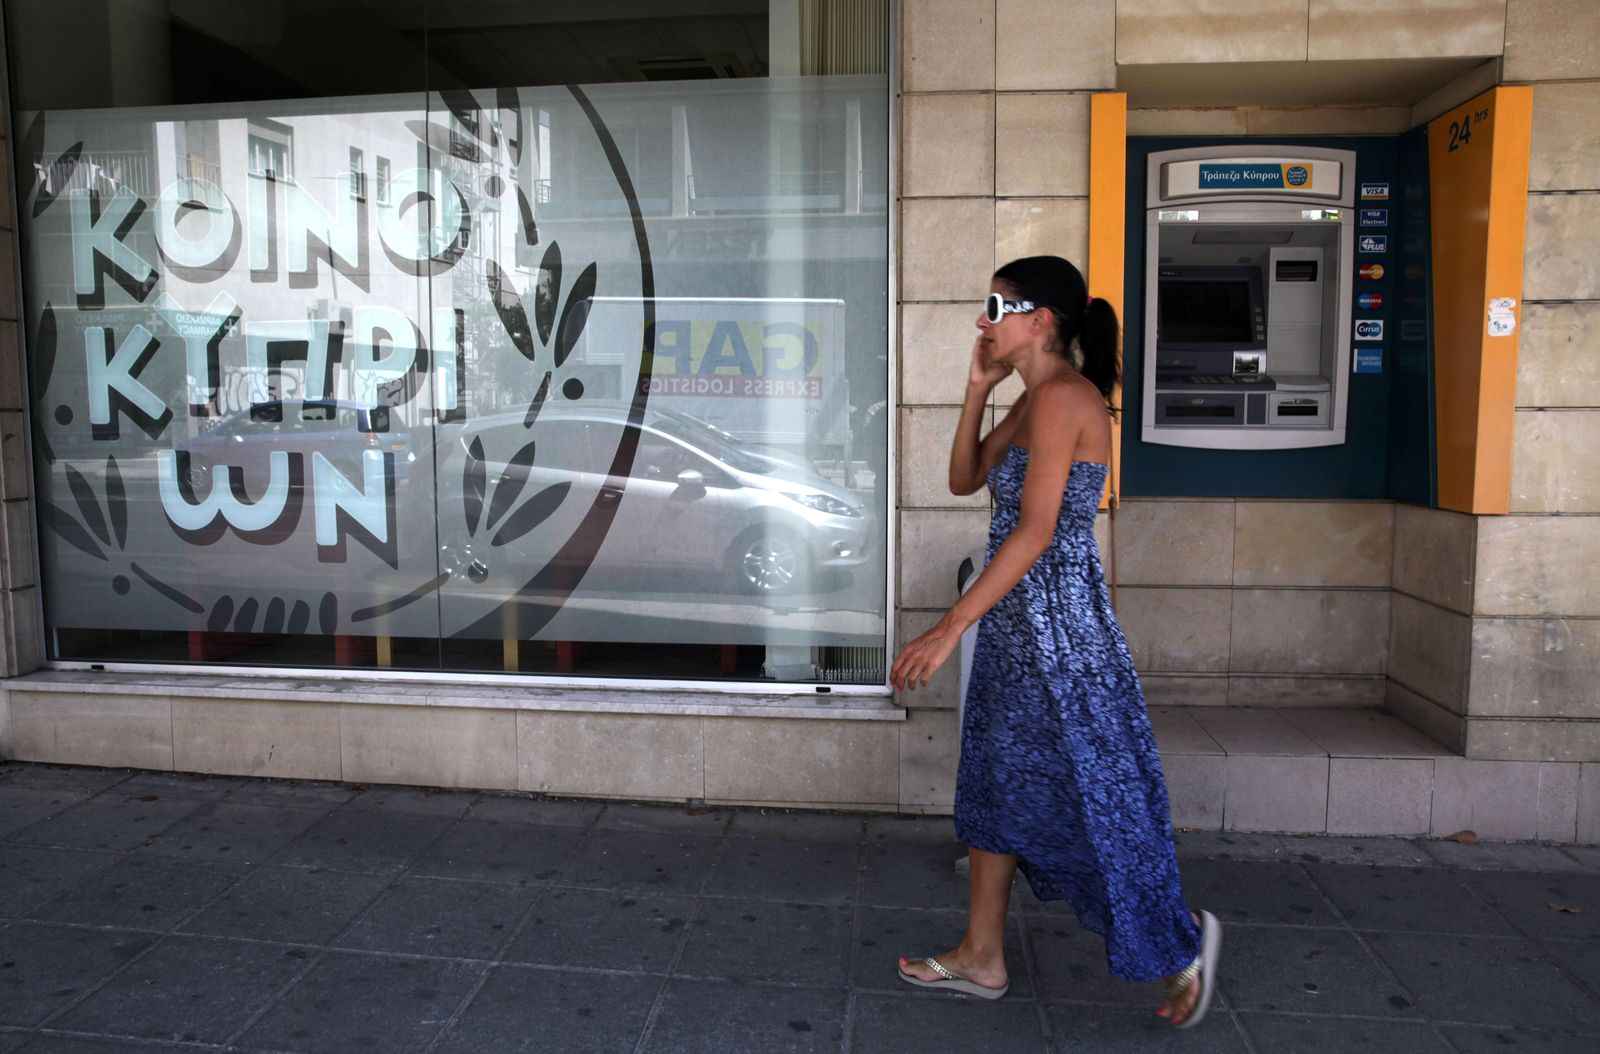 Zypern / Finanzkrise / Bank of Cyprus